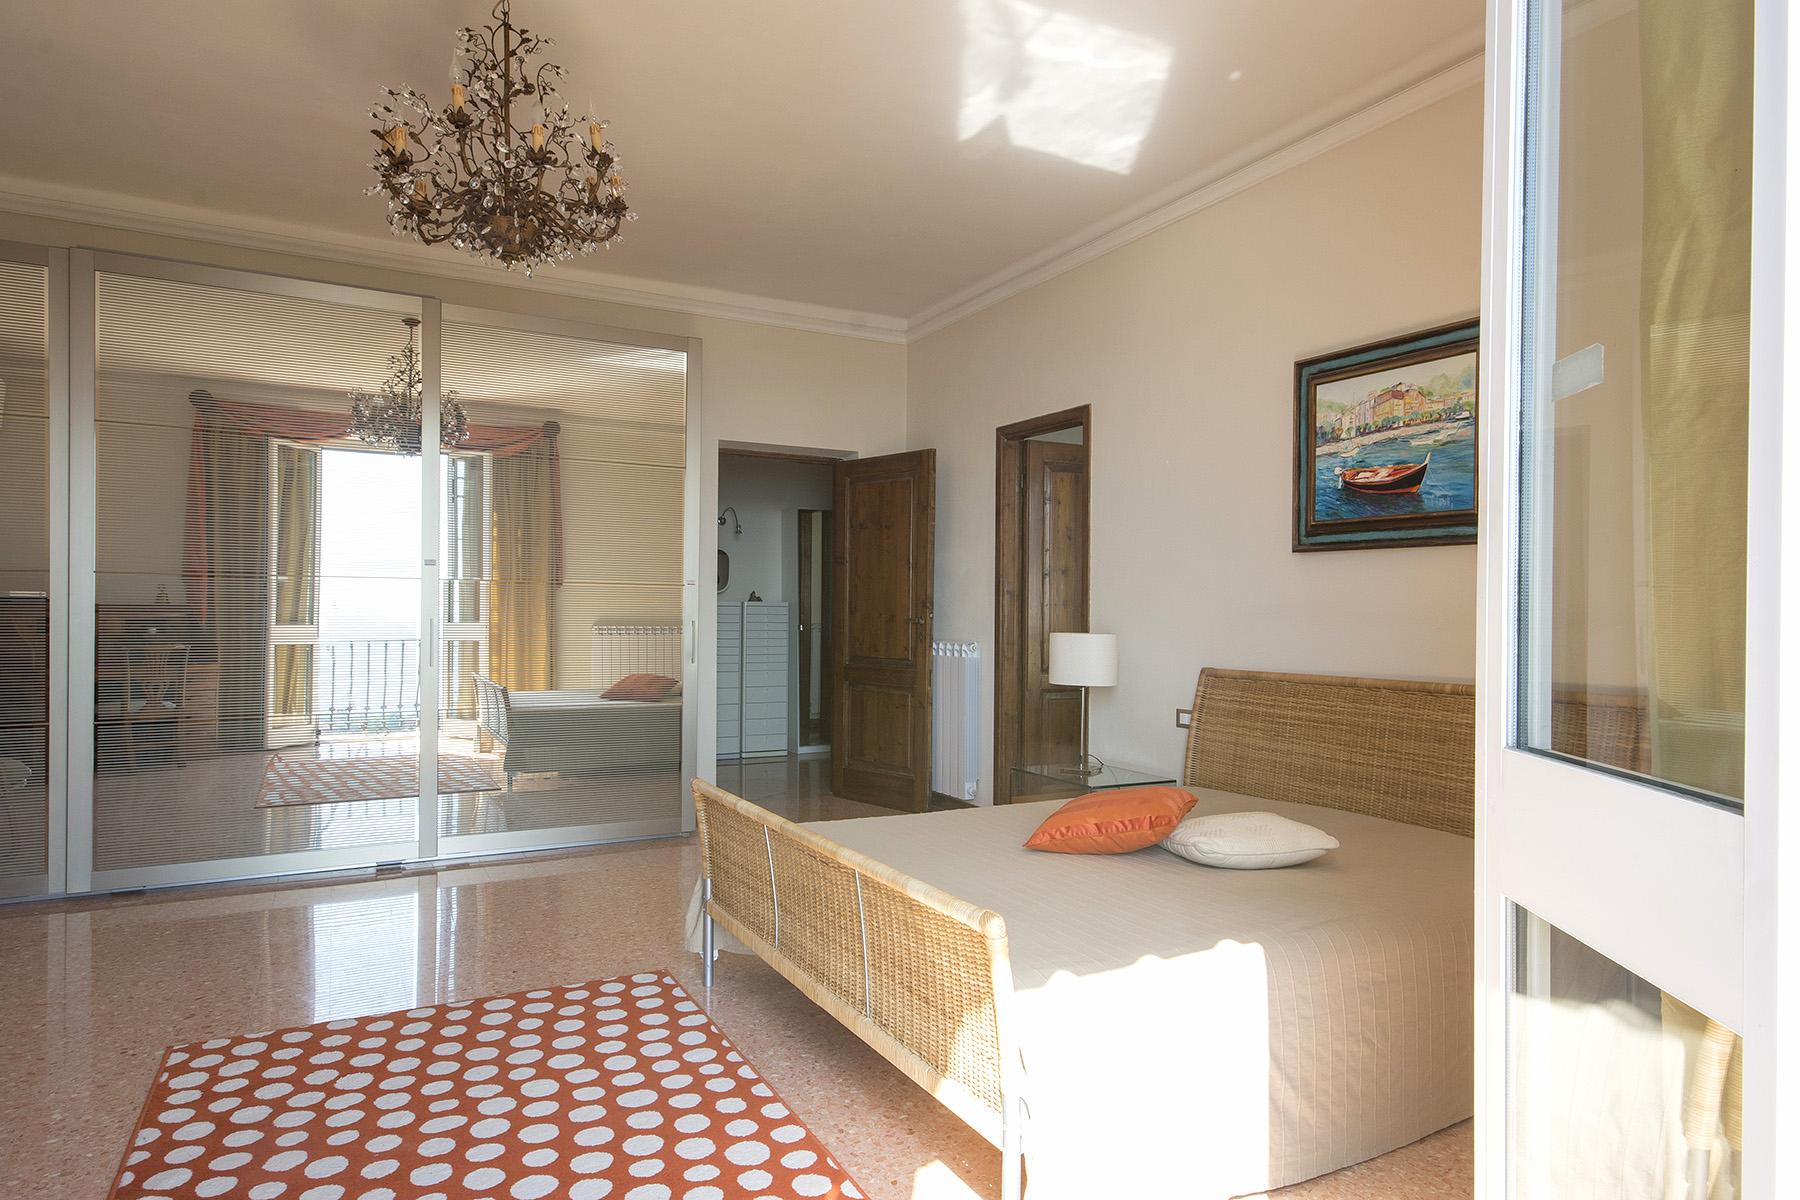 Villa in Vendita a Lerici: 5 locali, 580 mq - Foto 16